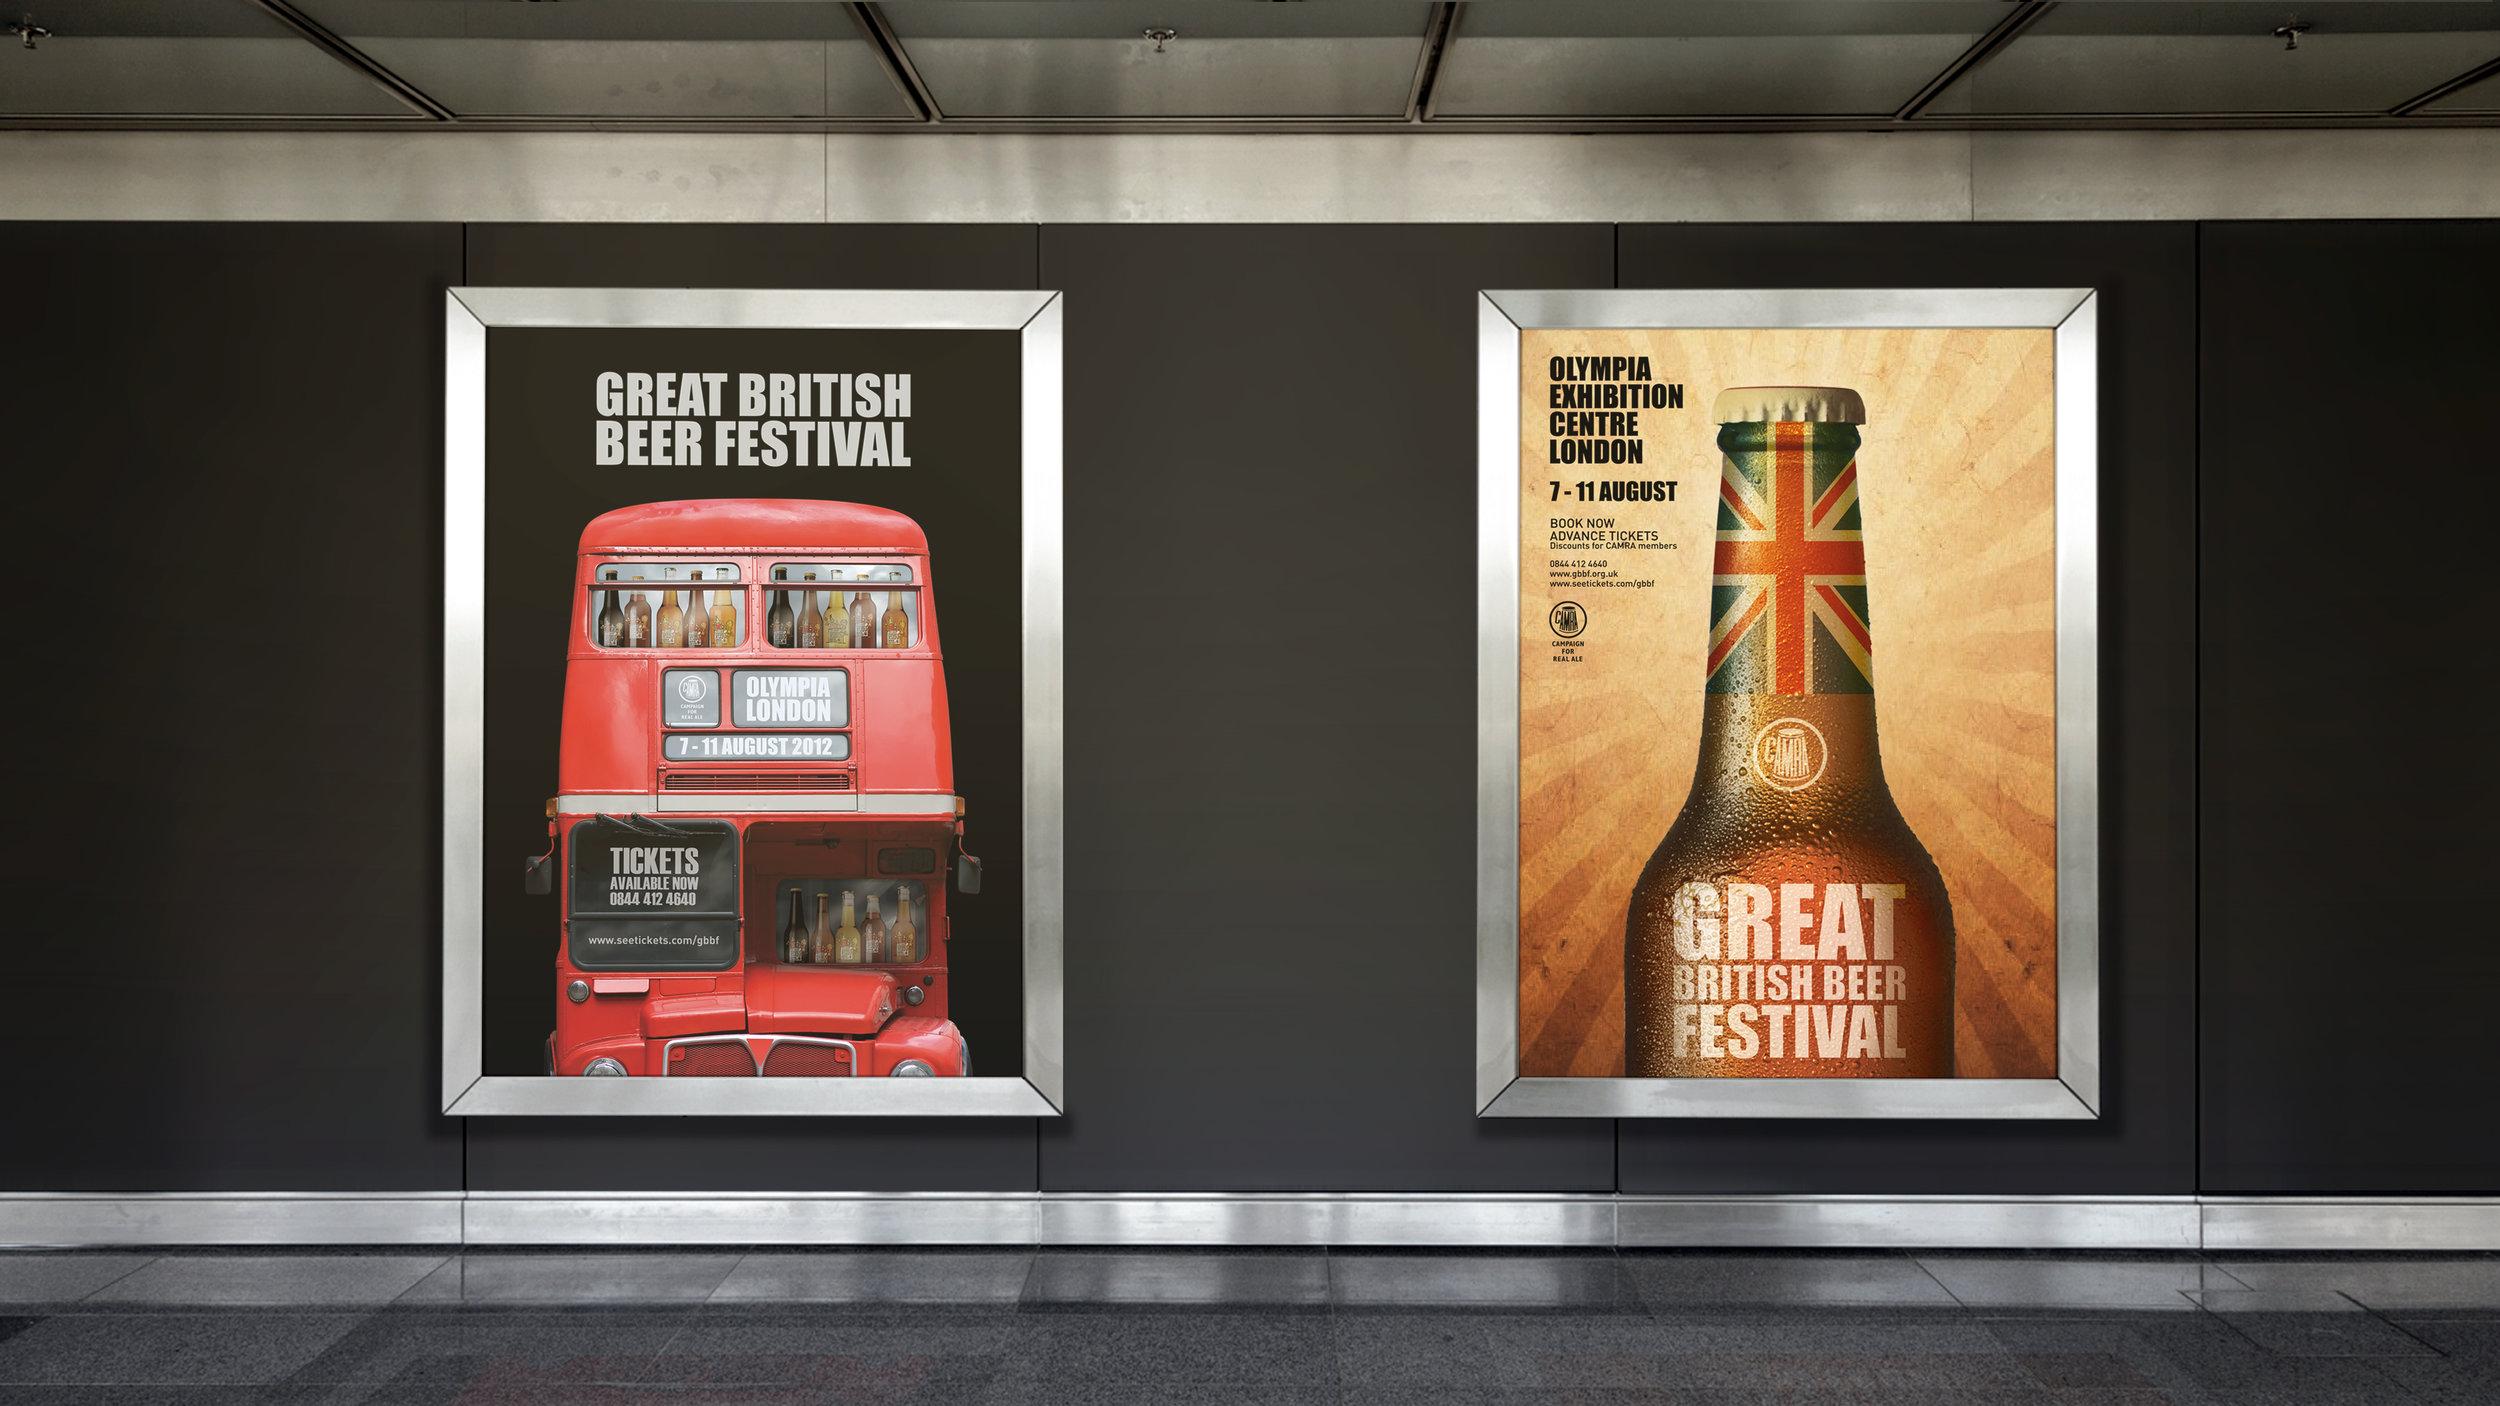 Brand_republica_camra_great_british_beer_festival_billboard_campaign.jpg